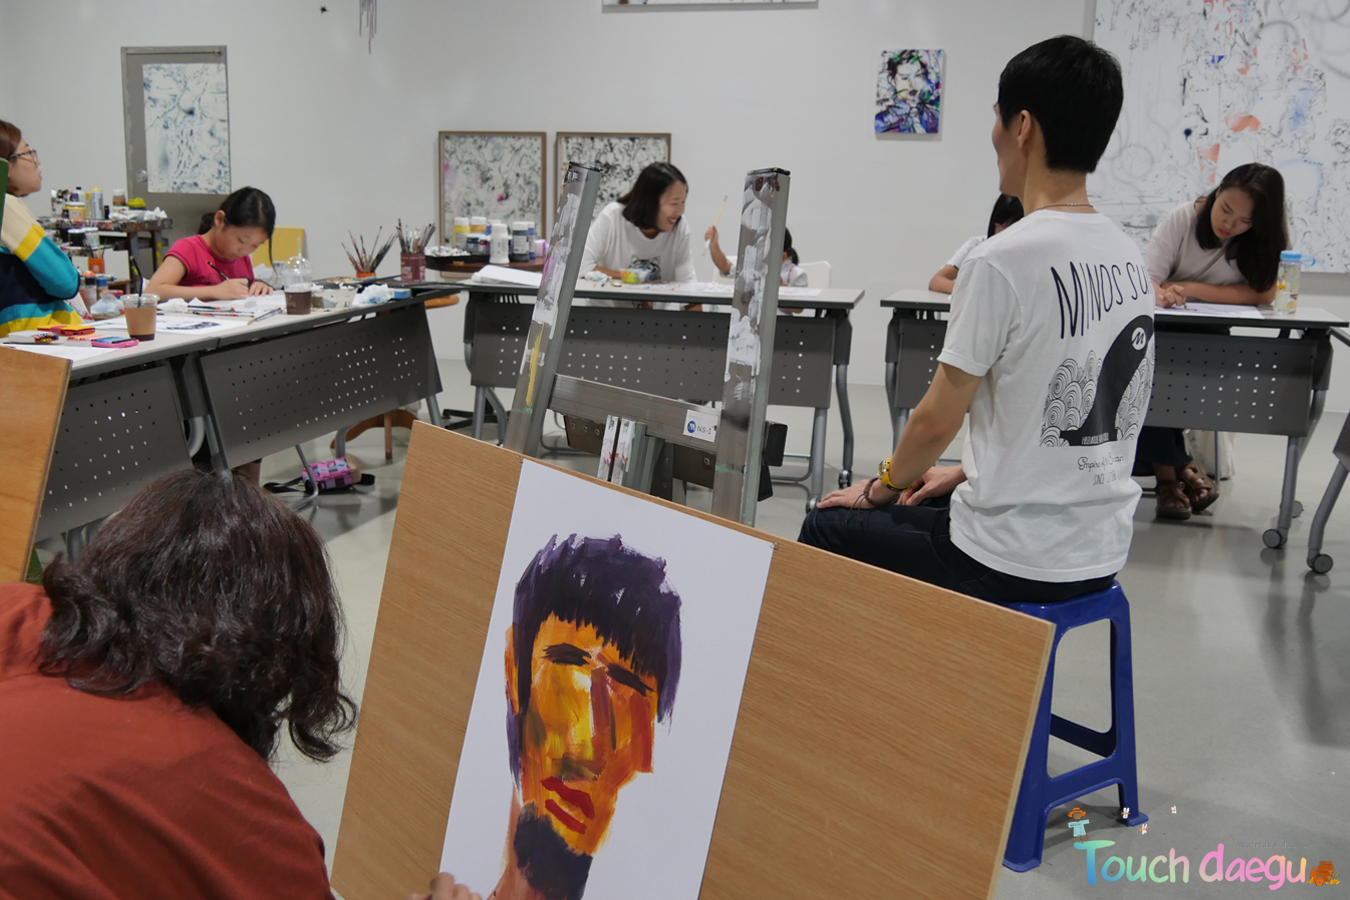 People are draqing a men in Daegu Art Factory